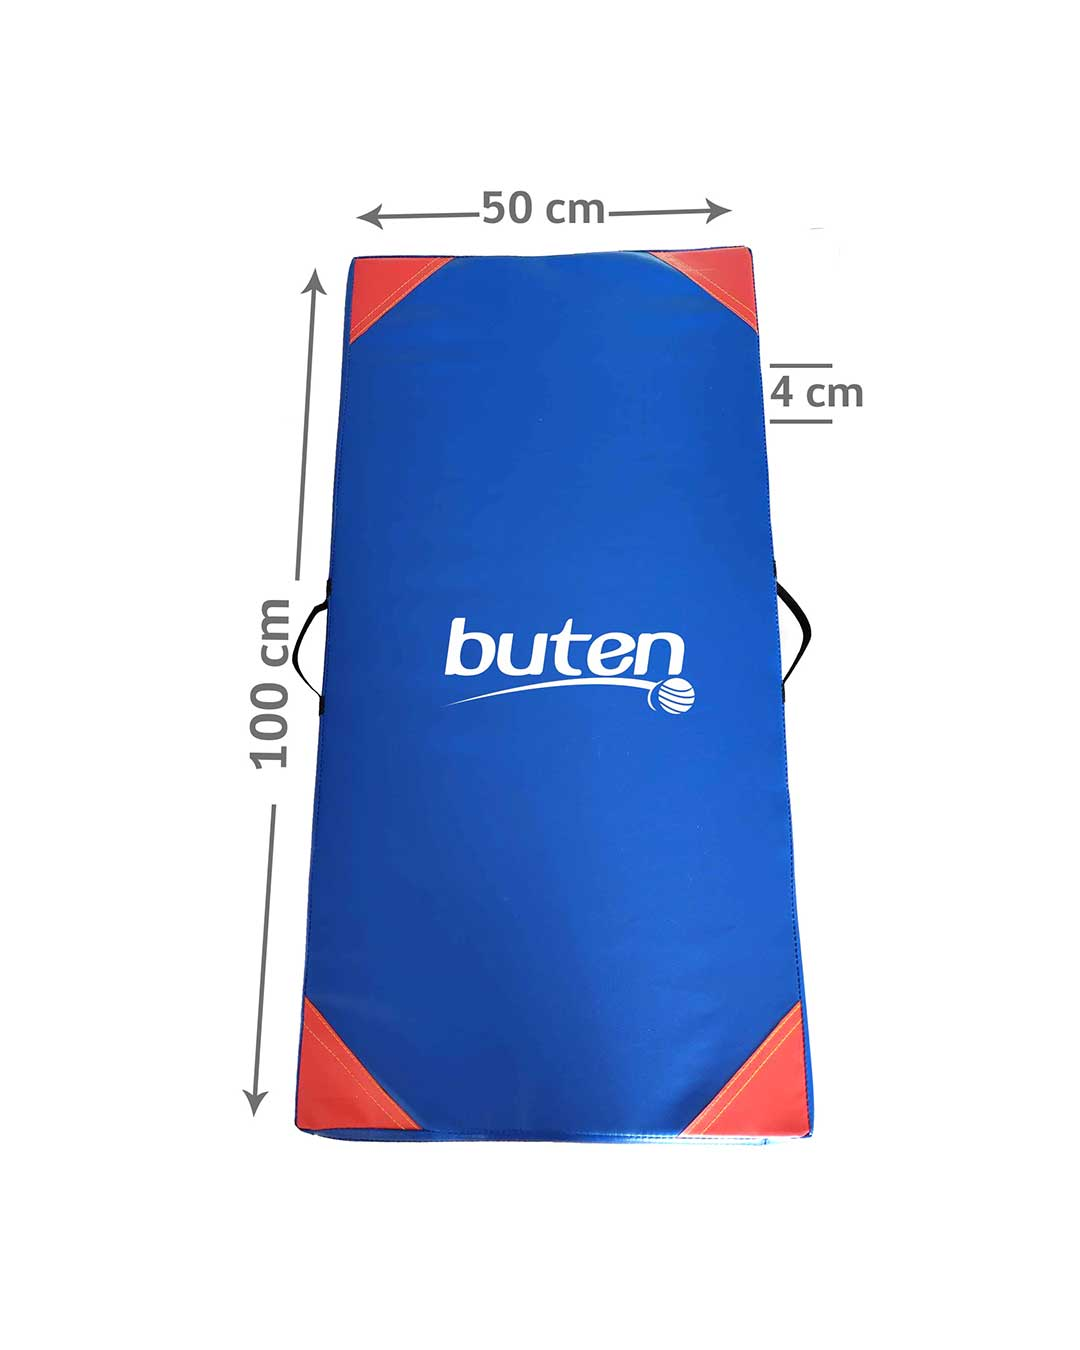 Colchoneta deportiva (100x50x4cm) marca BUTEN - XPRO 100 - Chile